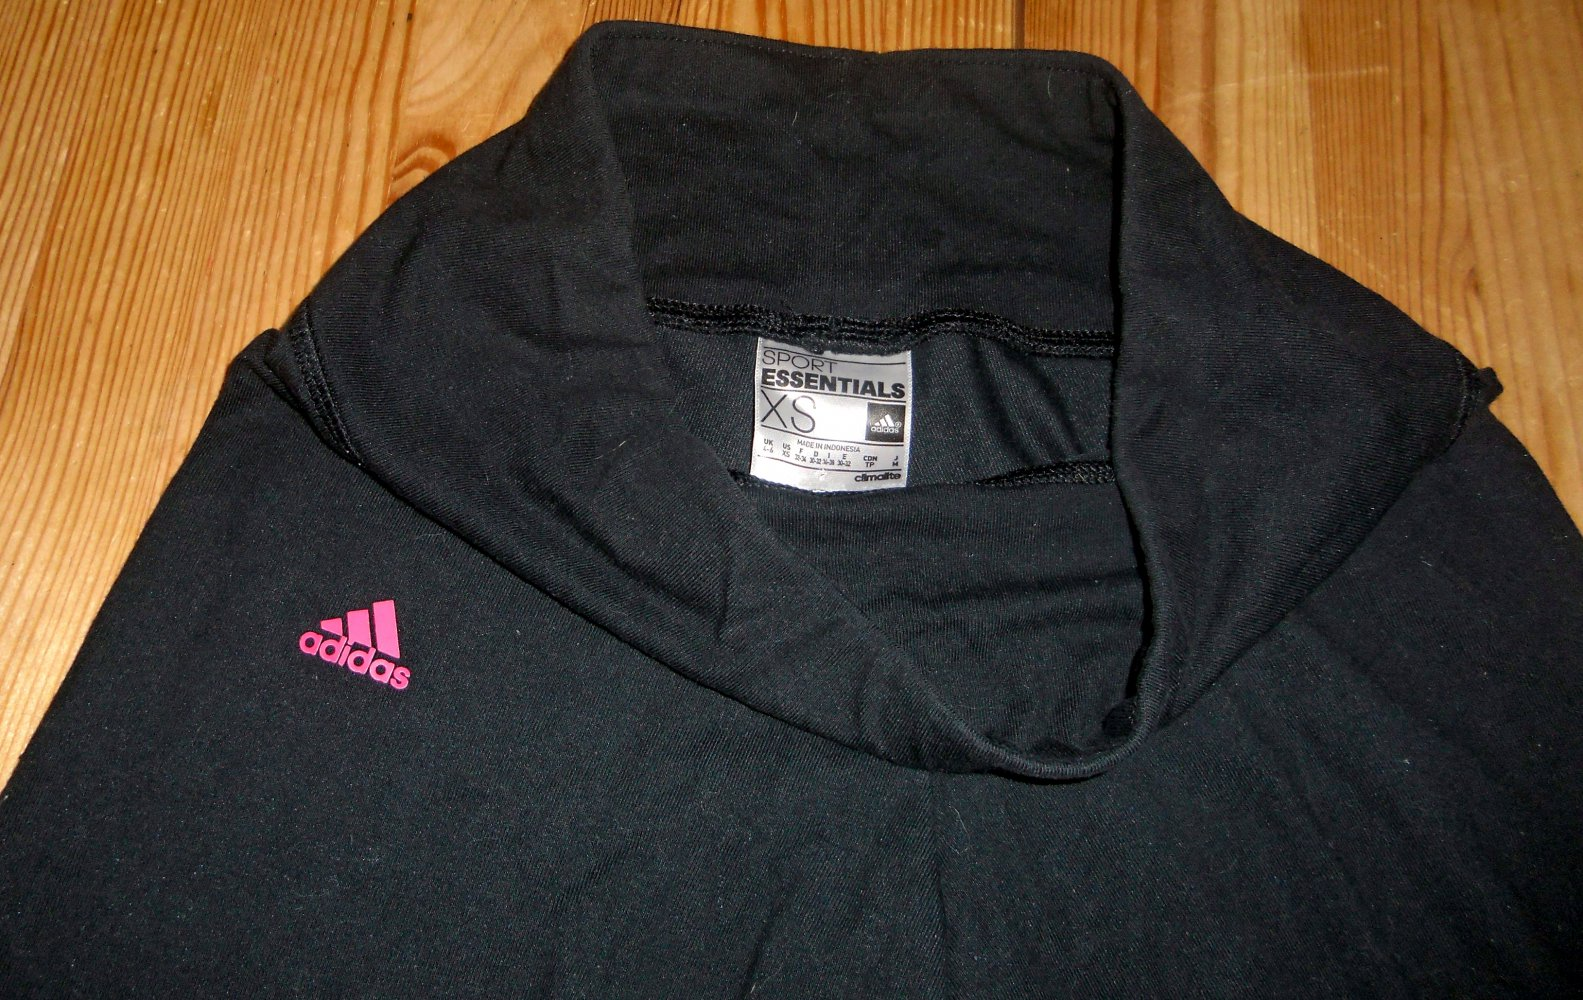 Sporthose kurze Hose, Gr. 128, Adidas, climalite, super Zustand